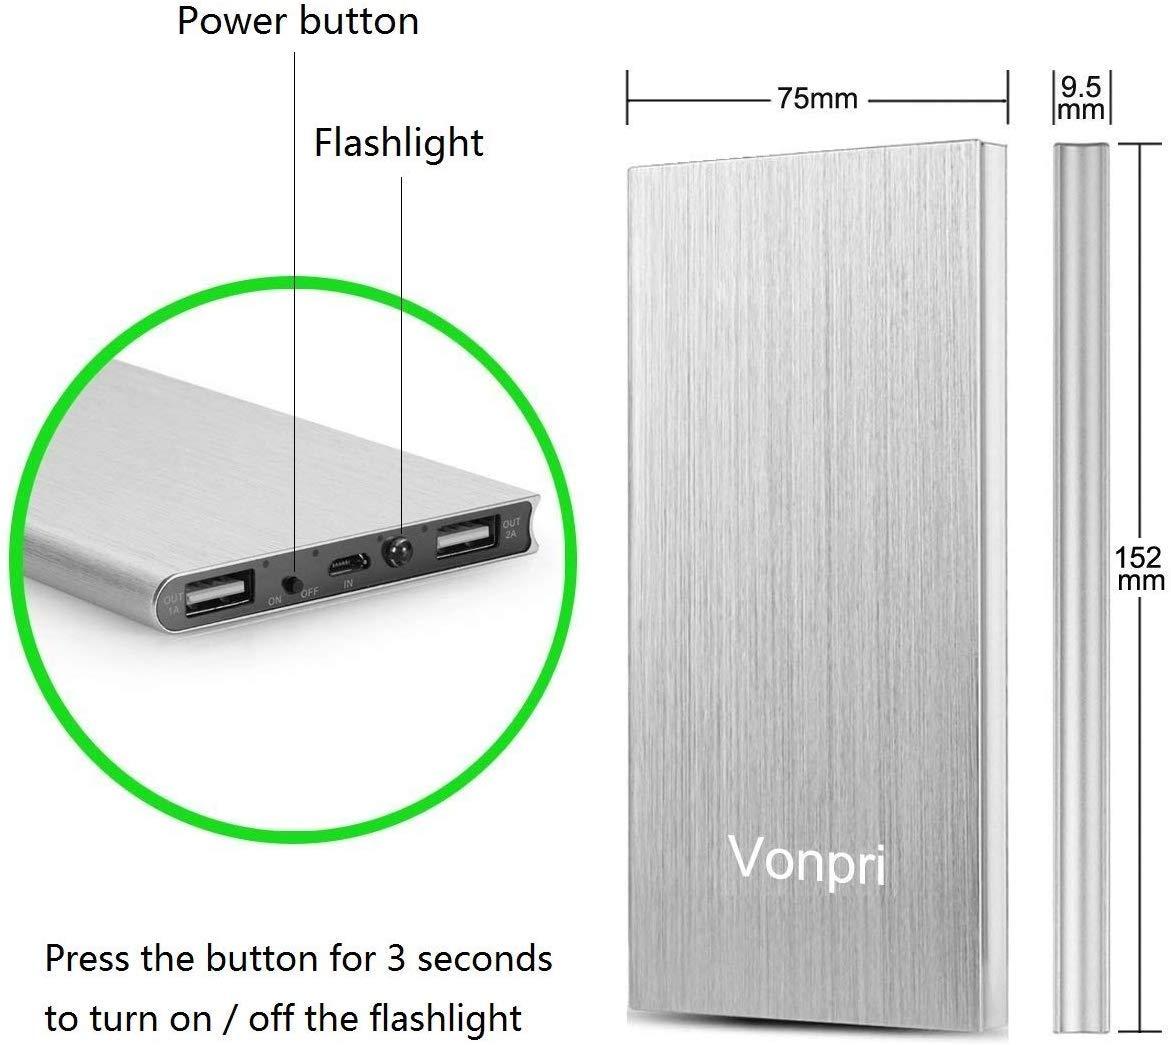 Vonpri 10000mah Caricabatterie Portatile Power Bank Batteria Esterna per iPhone7 iPad, Samsung Smartphones e Tablets… 2 spesavip